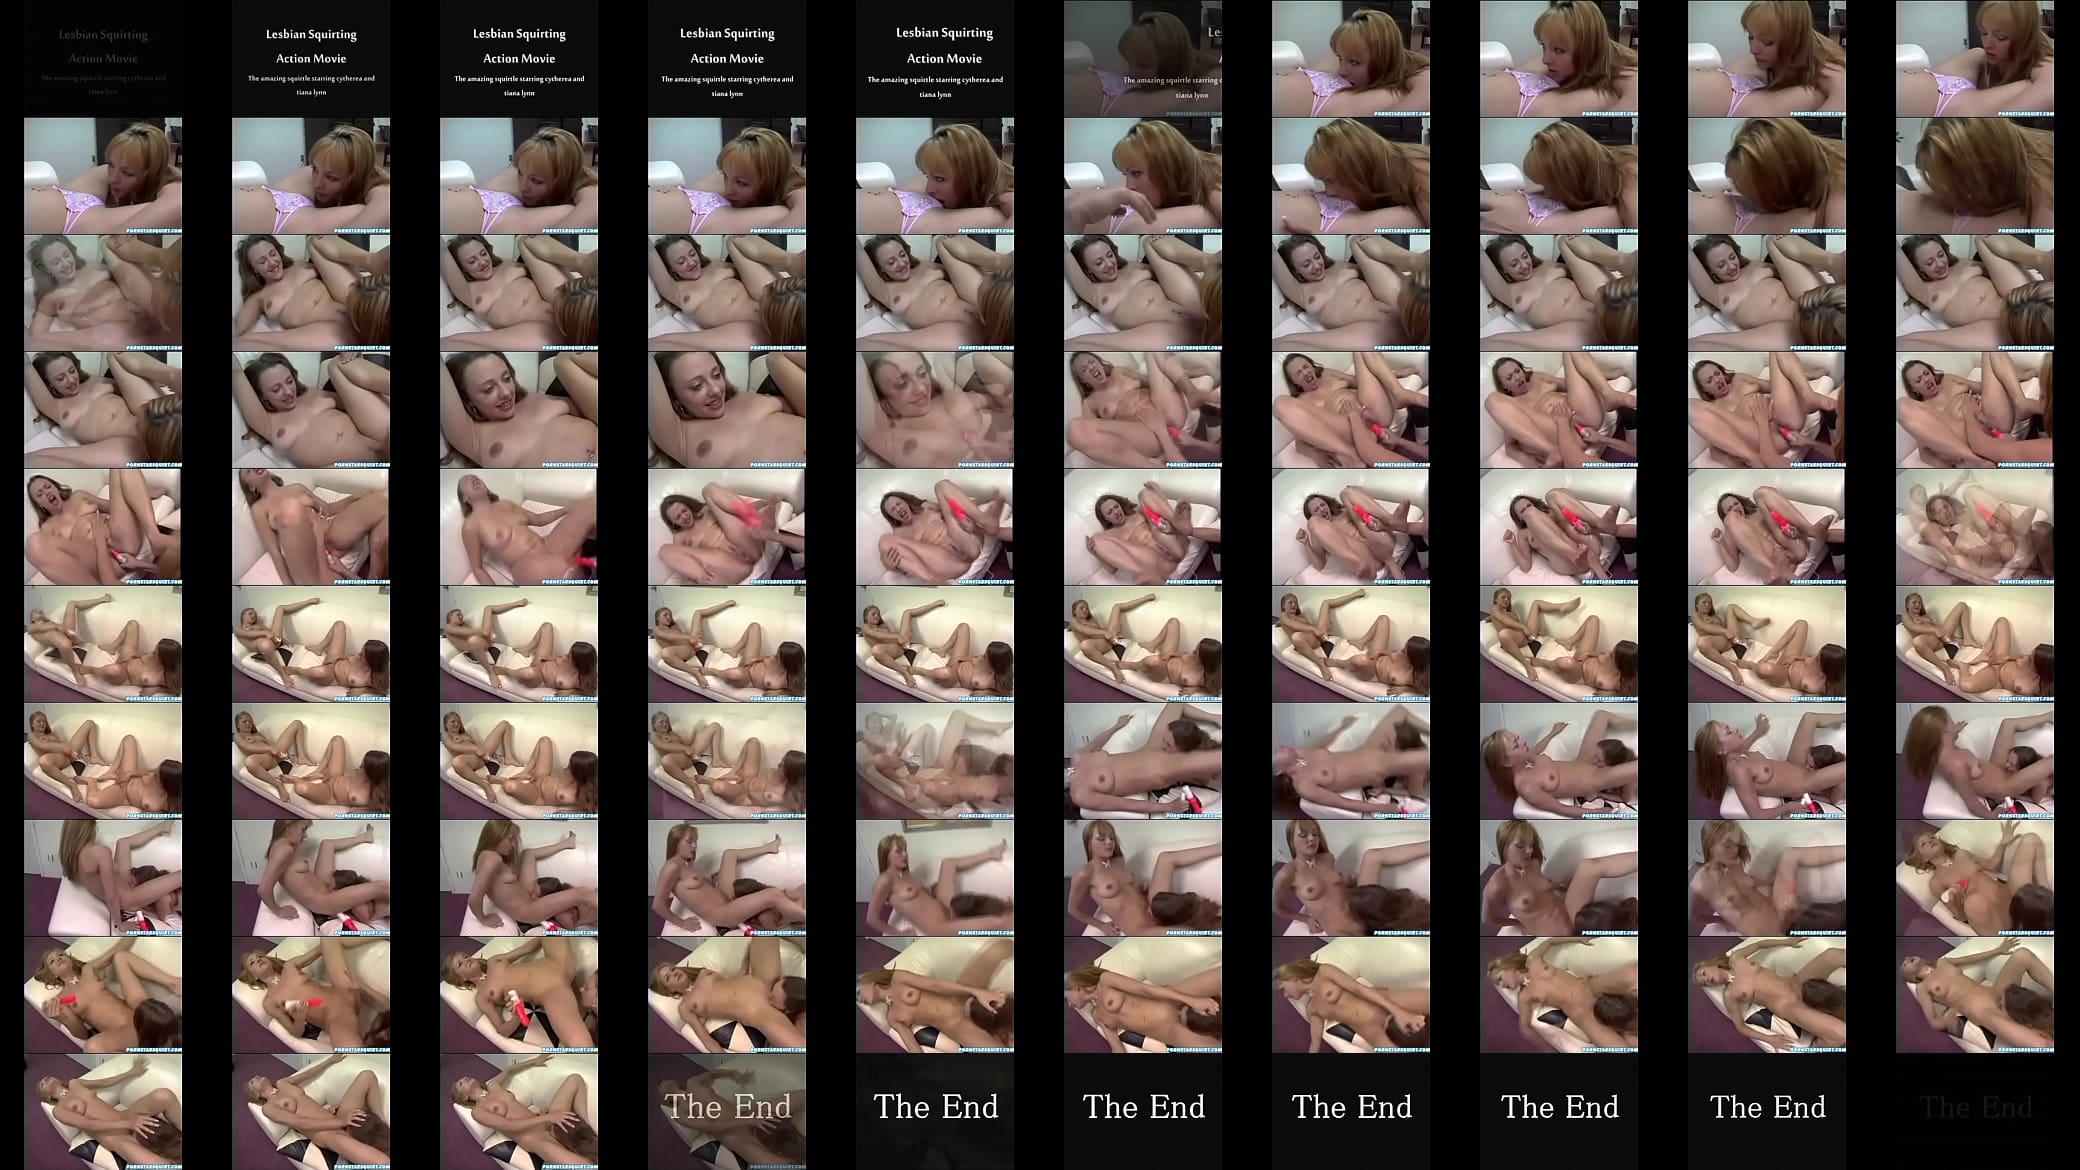 Lesbic sexc organ movie